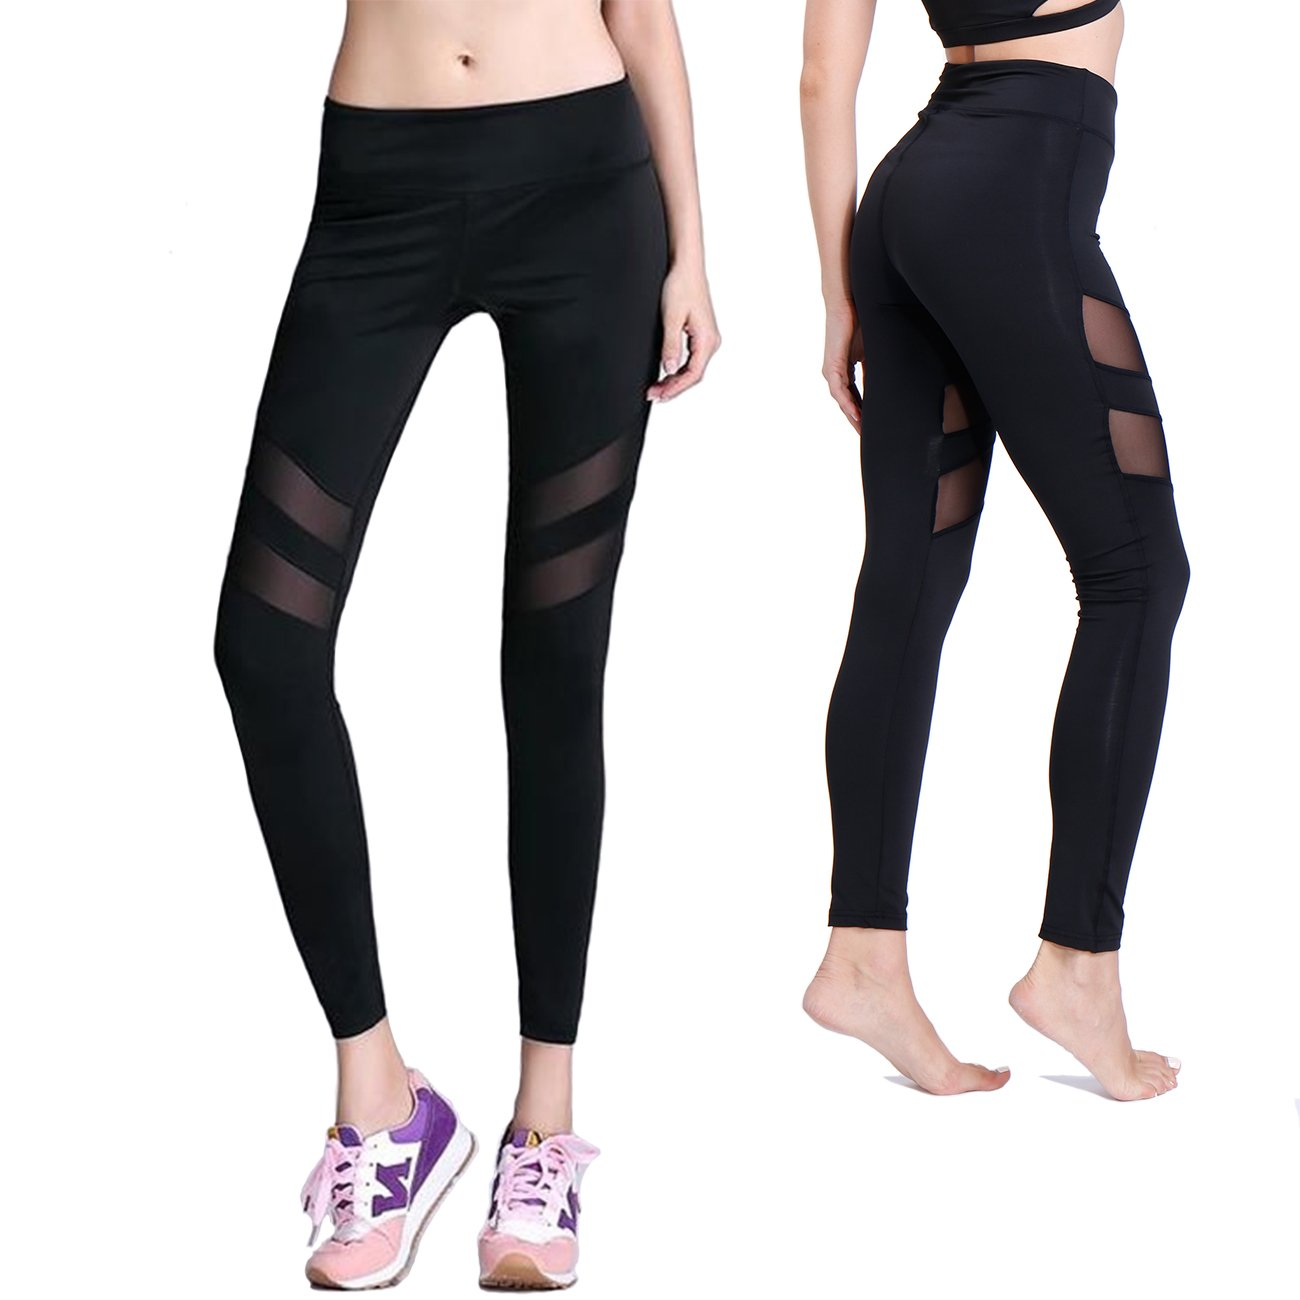 KIWI RATA Women Sports Mesh Trouser Gym Workout Fitness Capris Yoga Pant Legging (XL, Black #5)